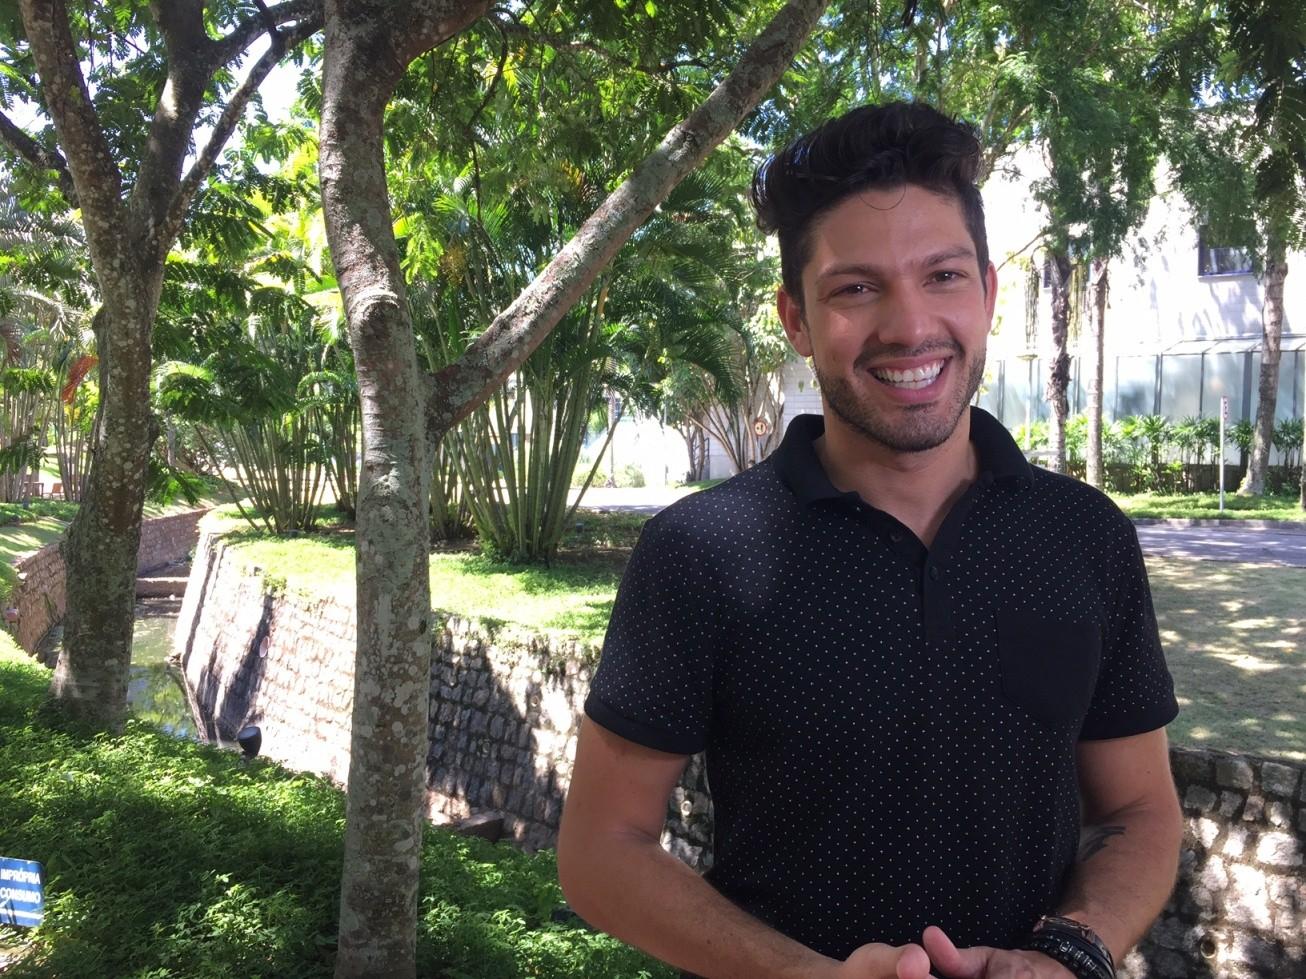 Luiz Felipe revela que tem esperanas de engatar romance com Mayla fora da casa (Foto: Louise Palma / Multishow)